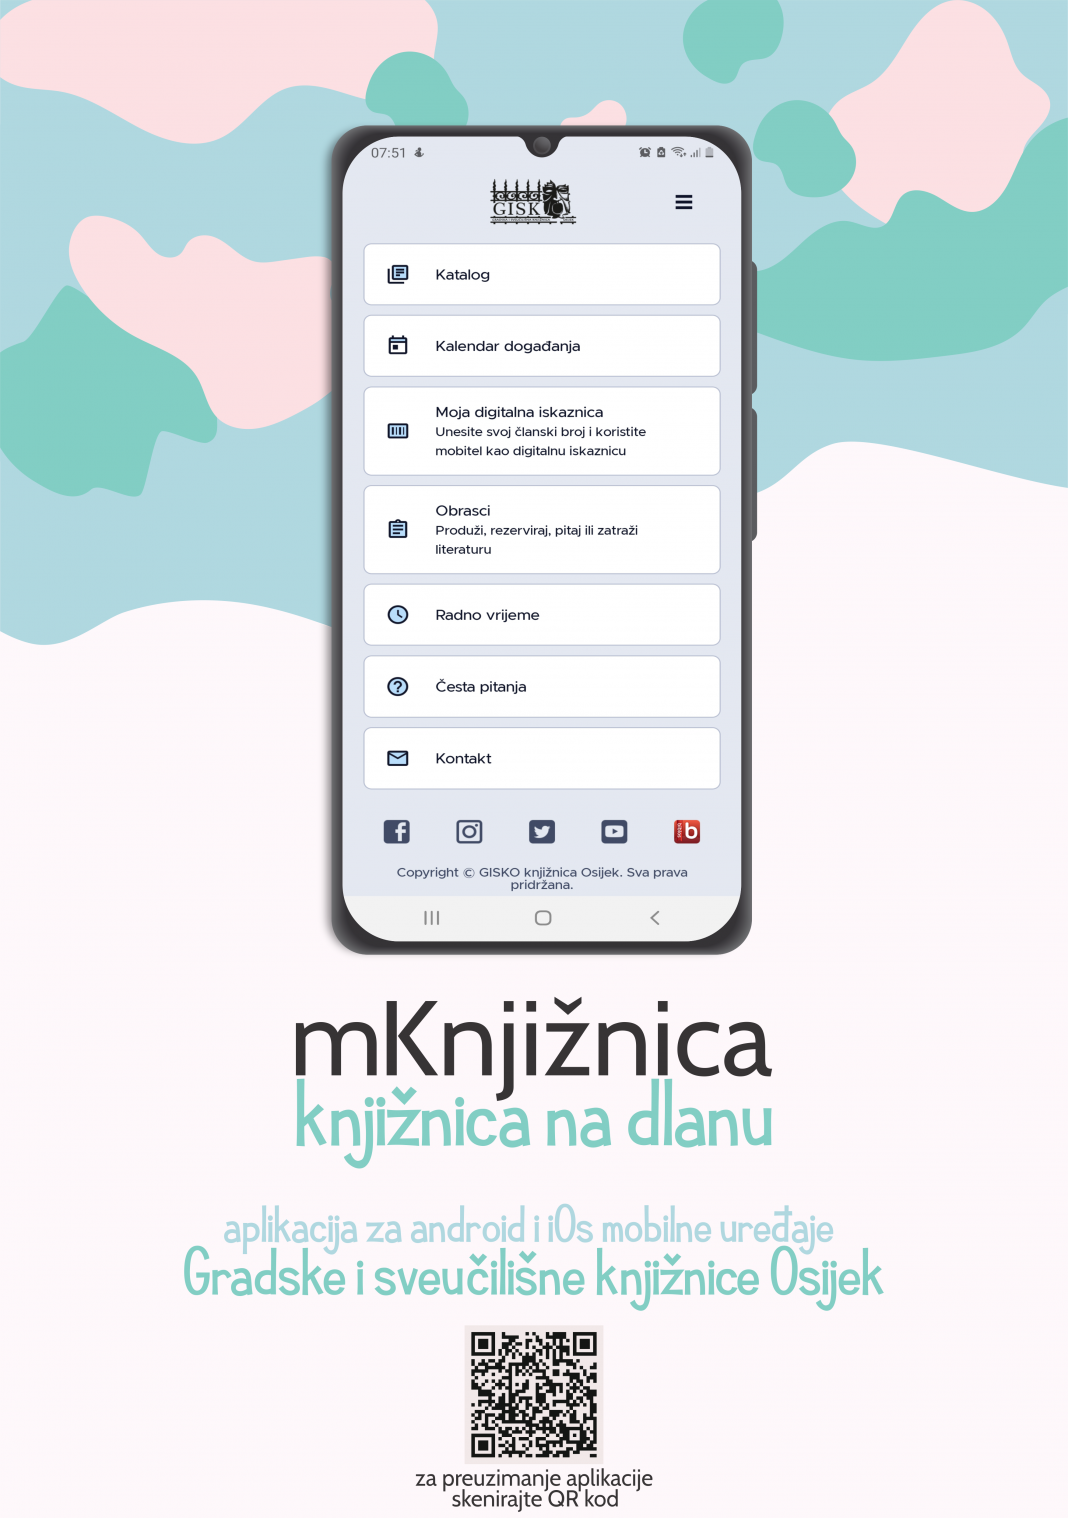 Mobilna aplikacija mKnjižnica